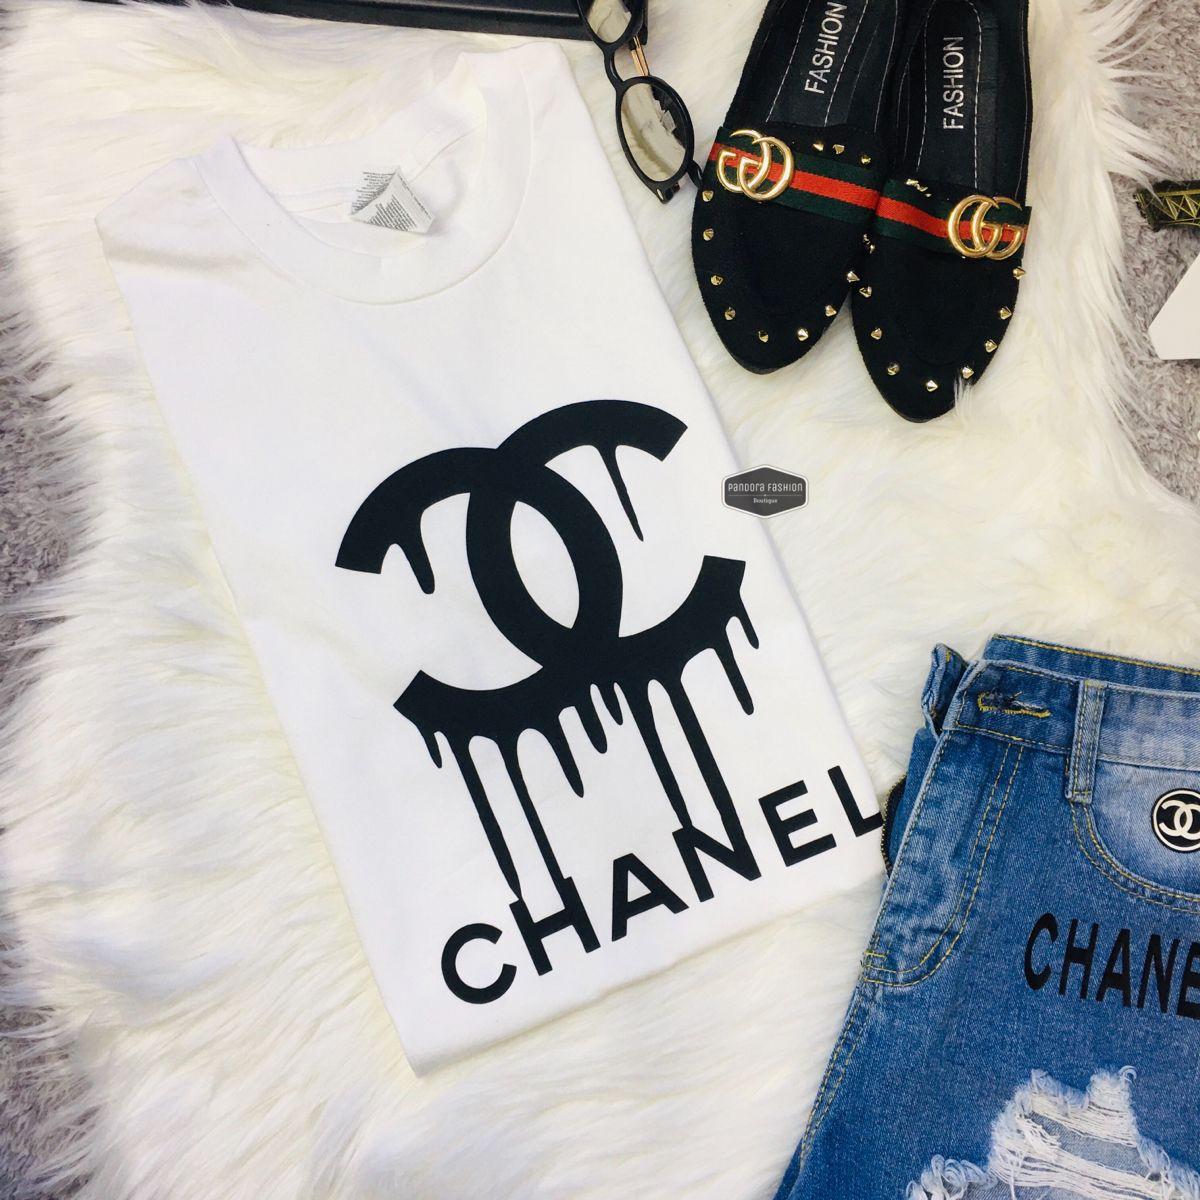 Tshirt CC Paris n5 logo graphic100 cotton unissex in